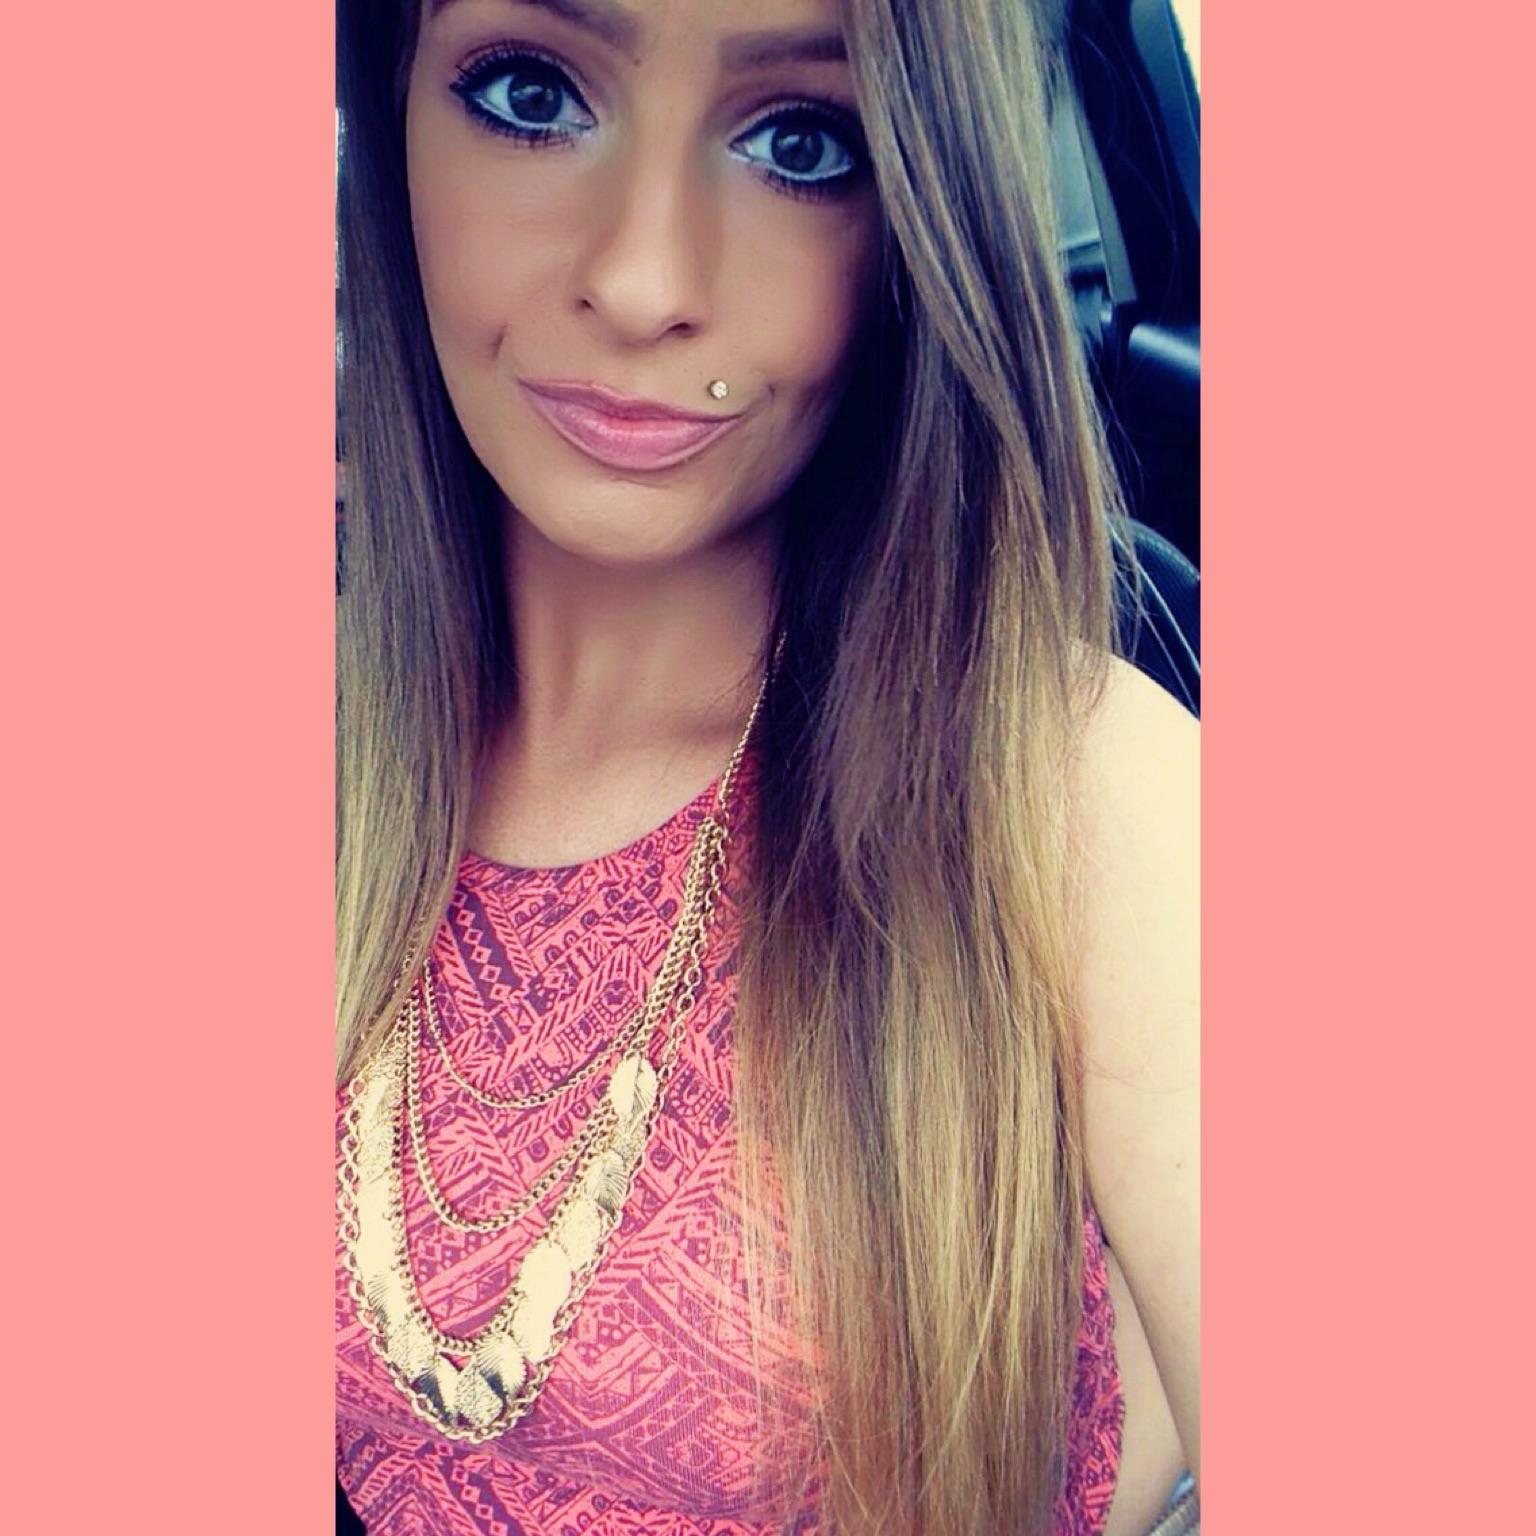 Meet the girl behind the blog...